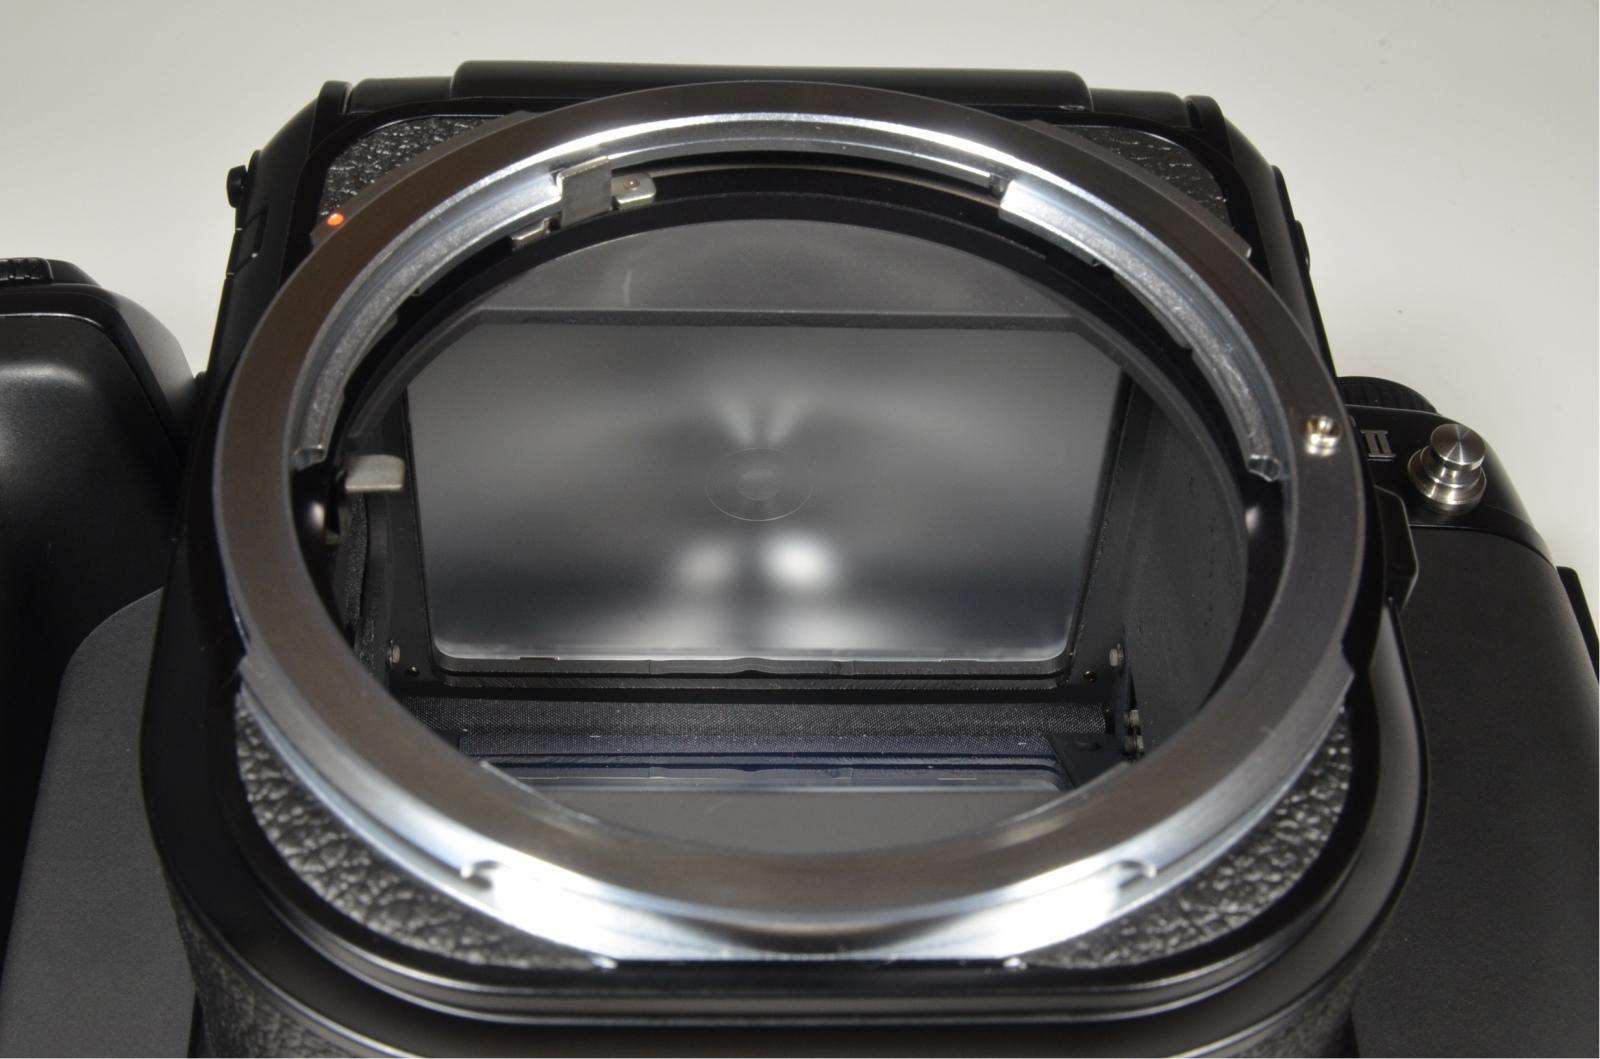 pentax 67 ii medium format slr film camera with wood grip